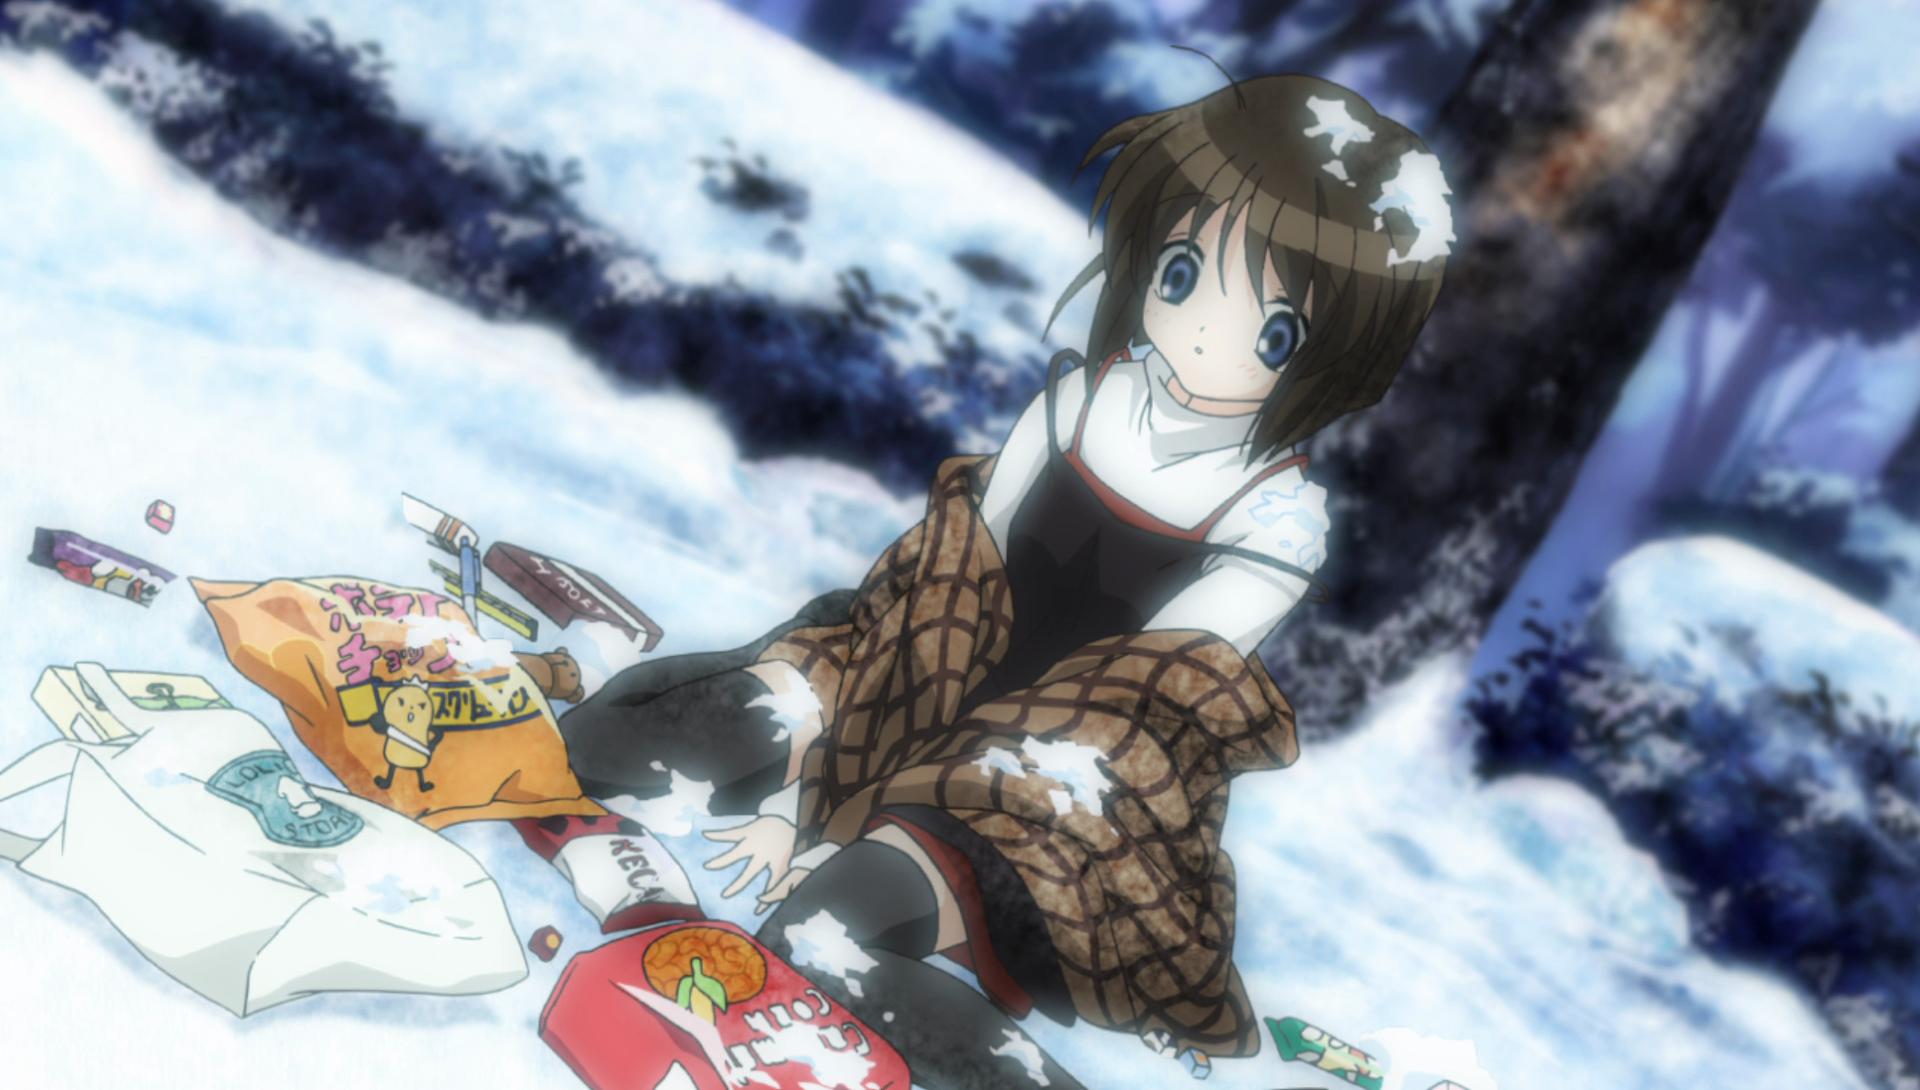 Kanon 2006 Anime Episode 2. Introit in the Snow